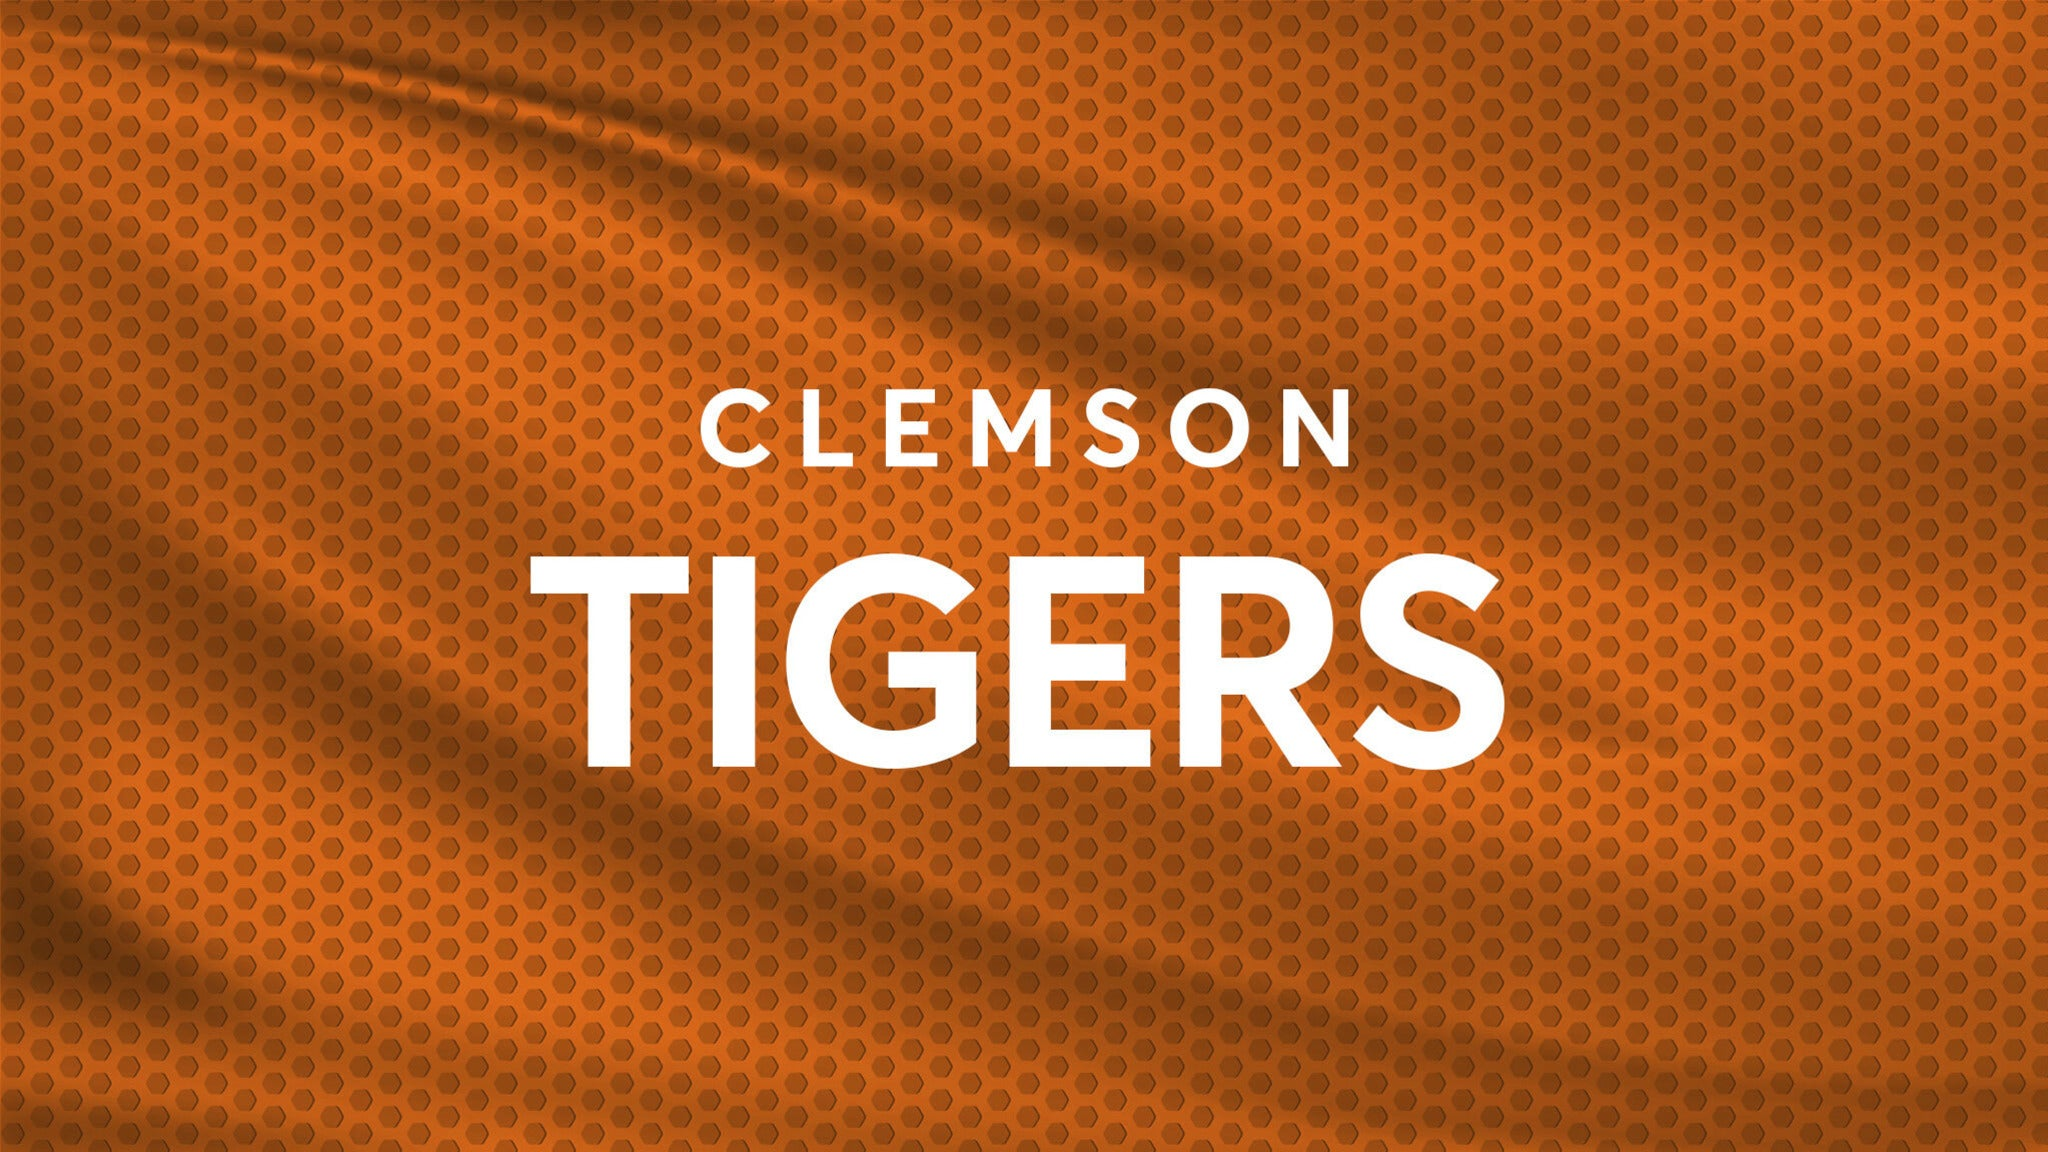 Clemson Tigers Football vs. Boston College Eagles Football